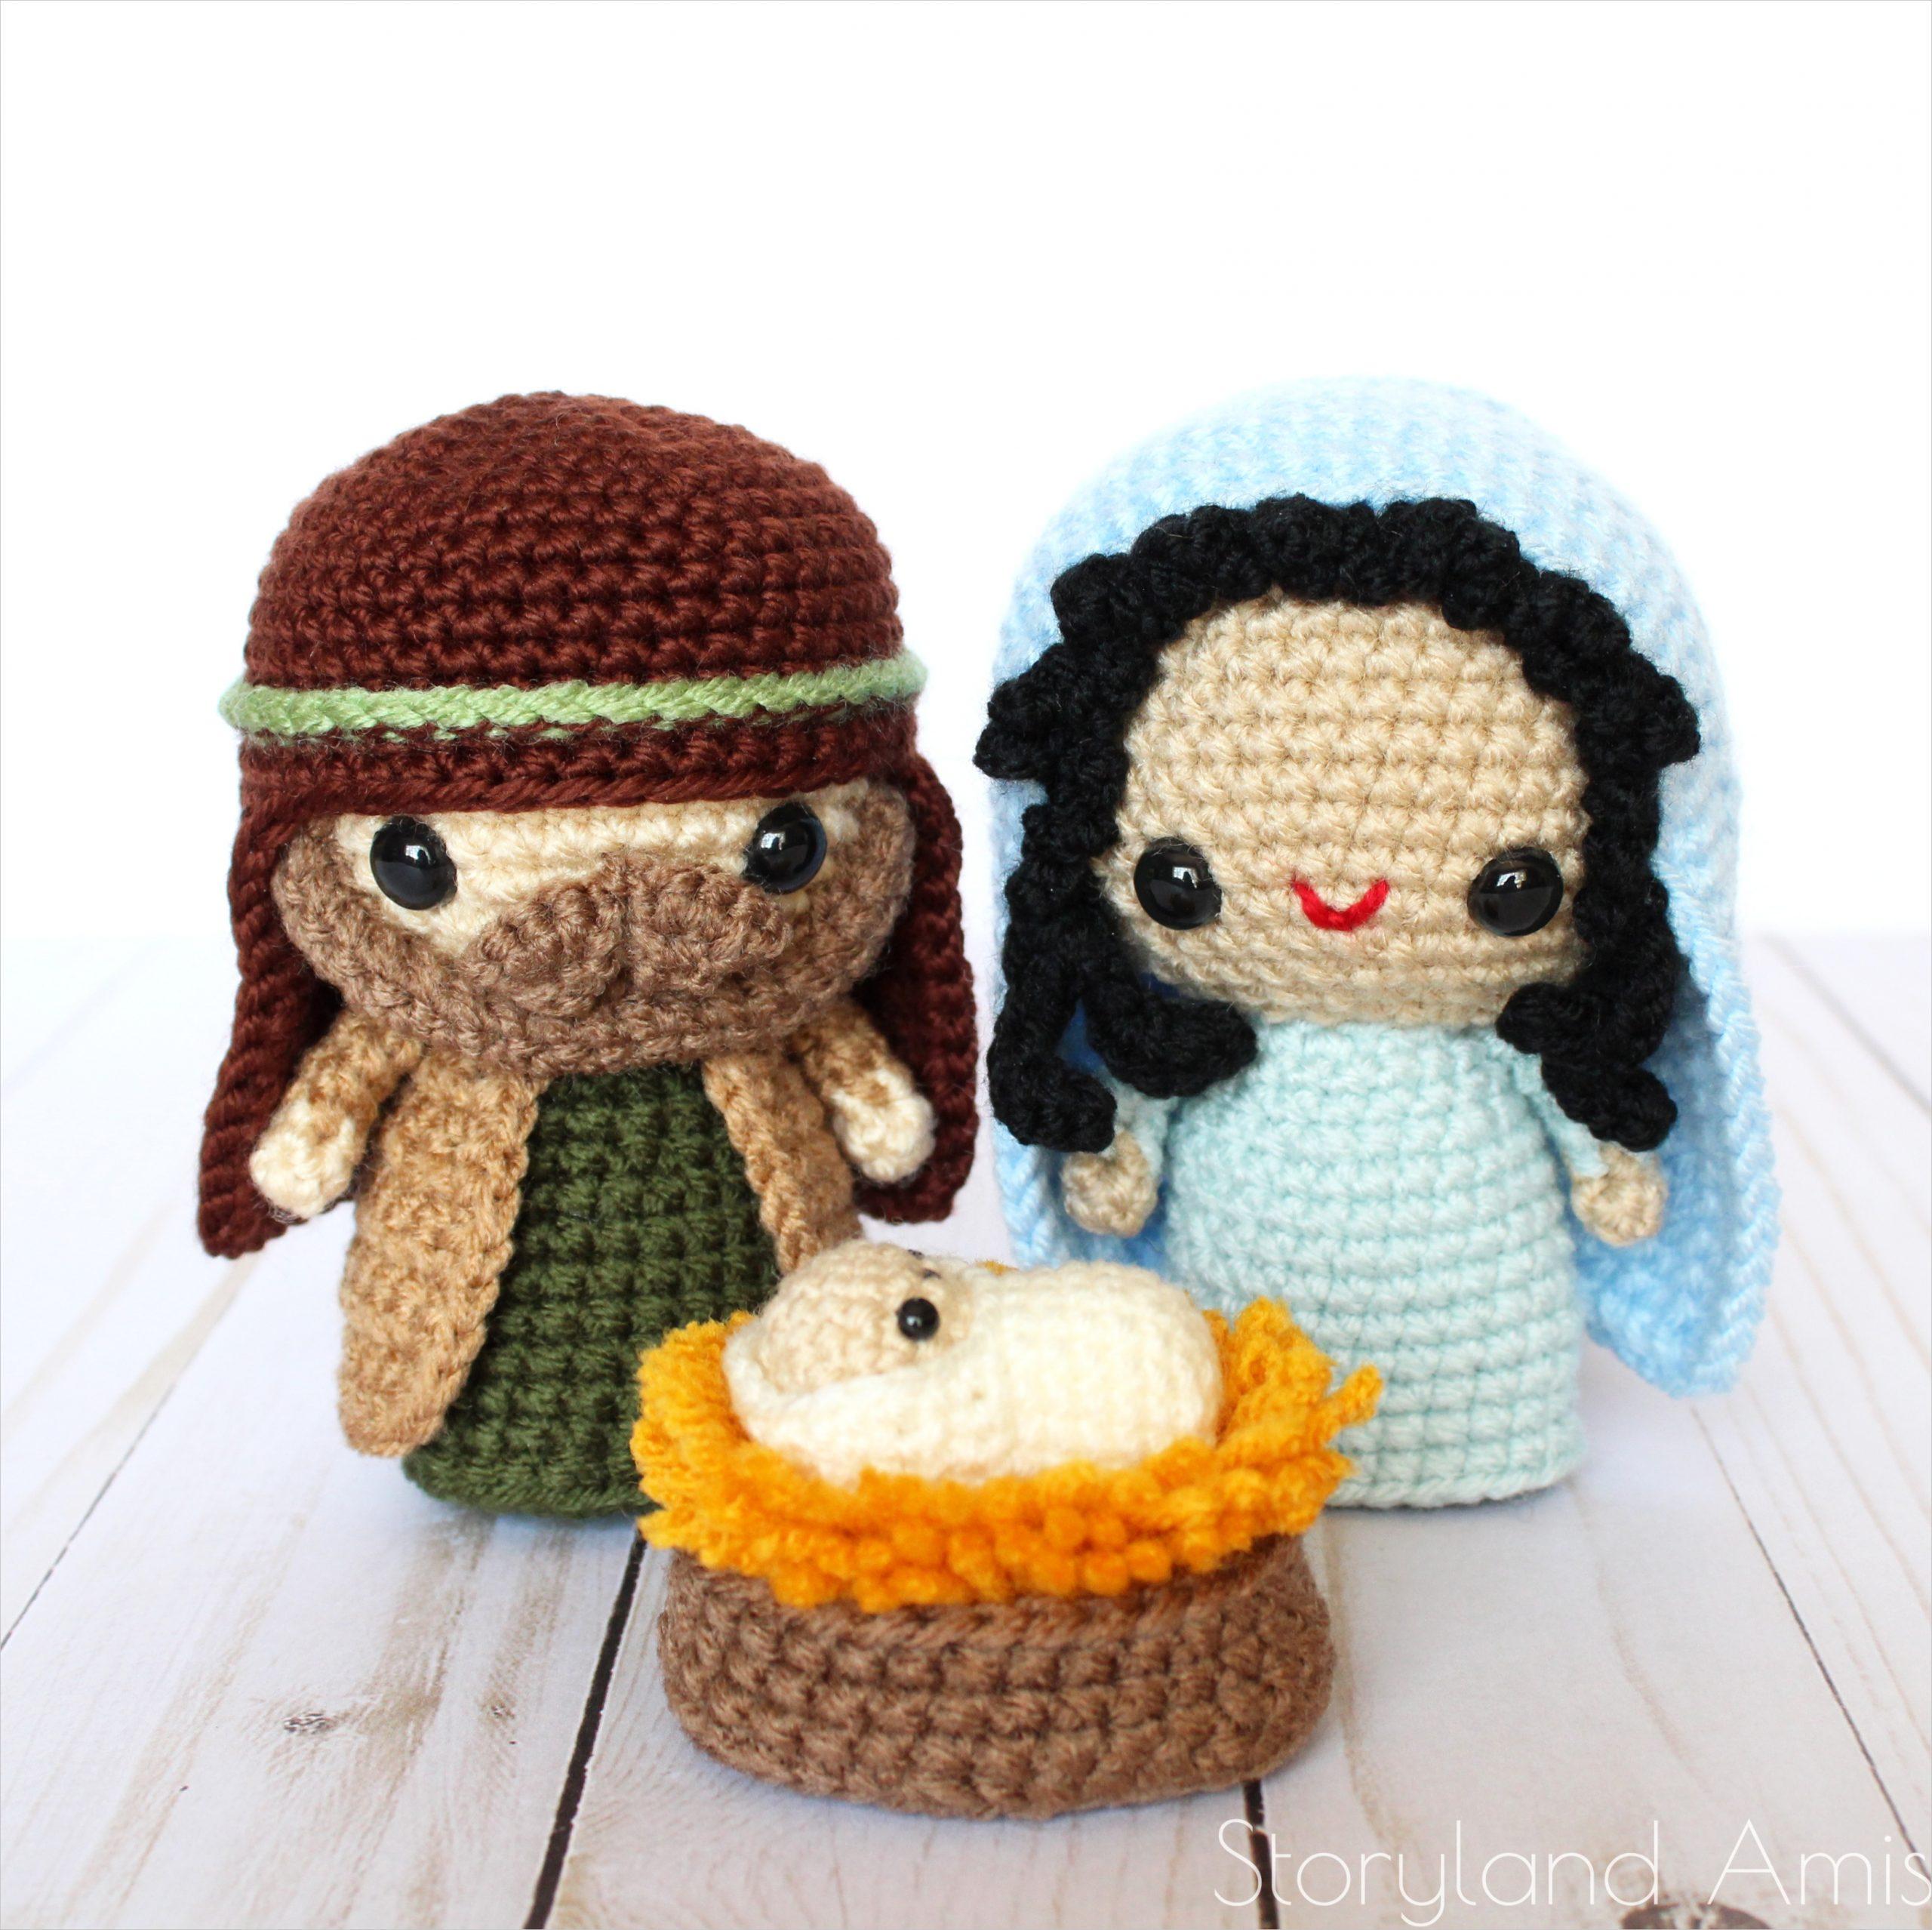 pattern plete amigurumi nativity set with mary joseph baby jesus shepherds sheep